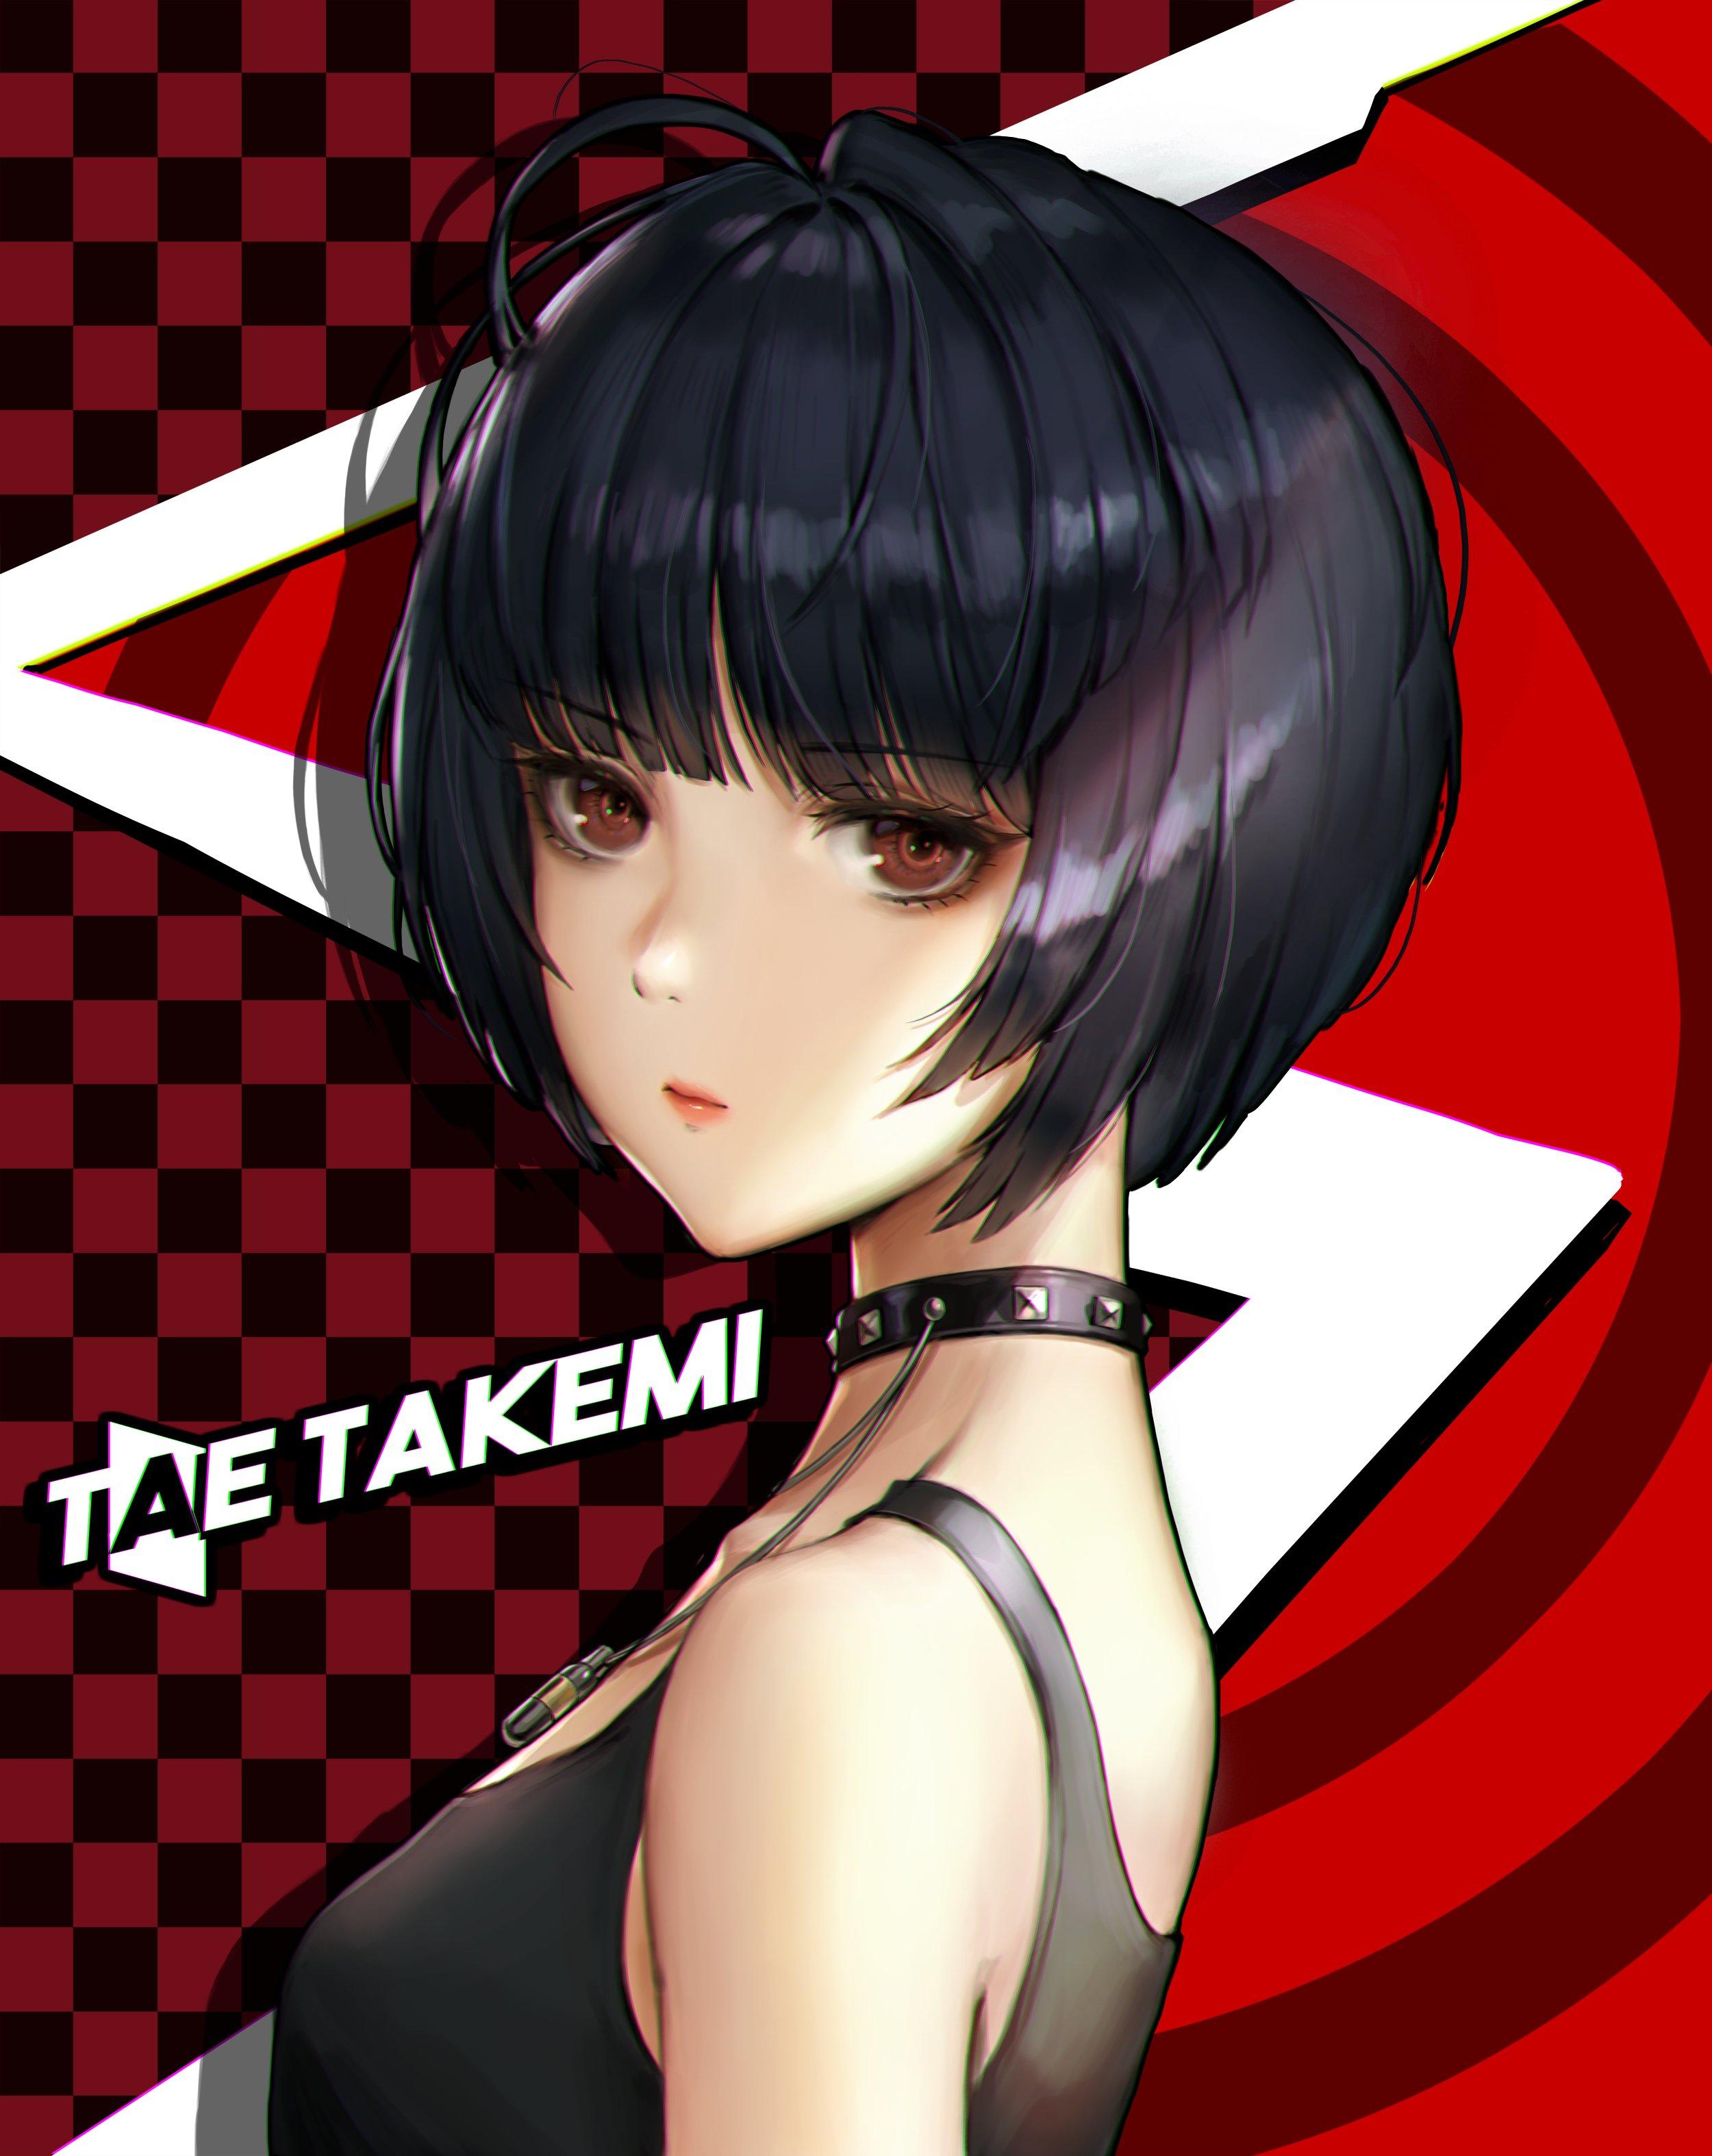 Takemi-Tae-Persona-5-Persona-Игры-6422878.jpeg - Persona 5